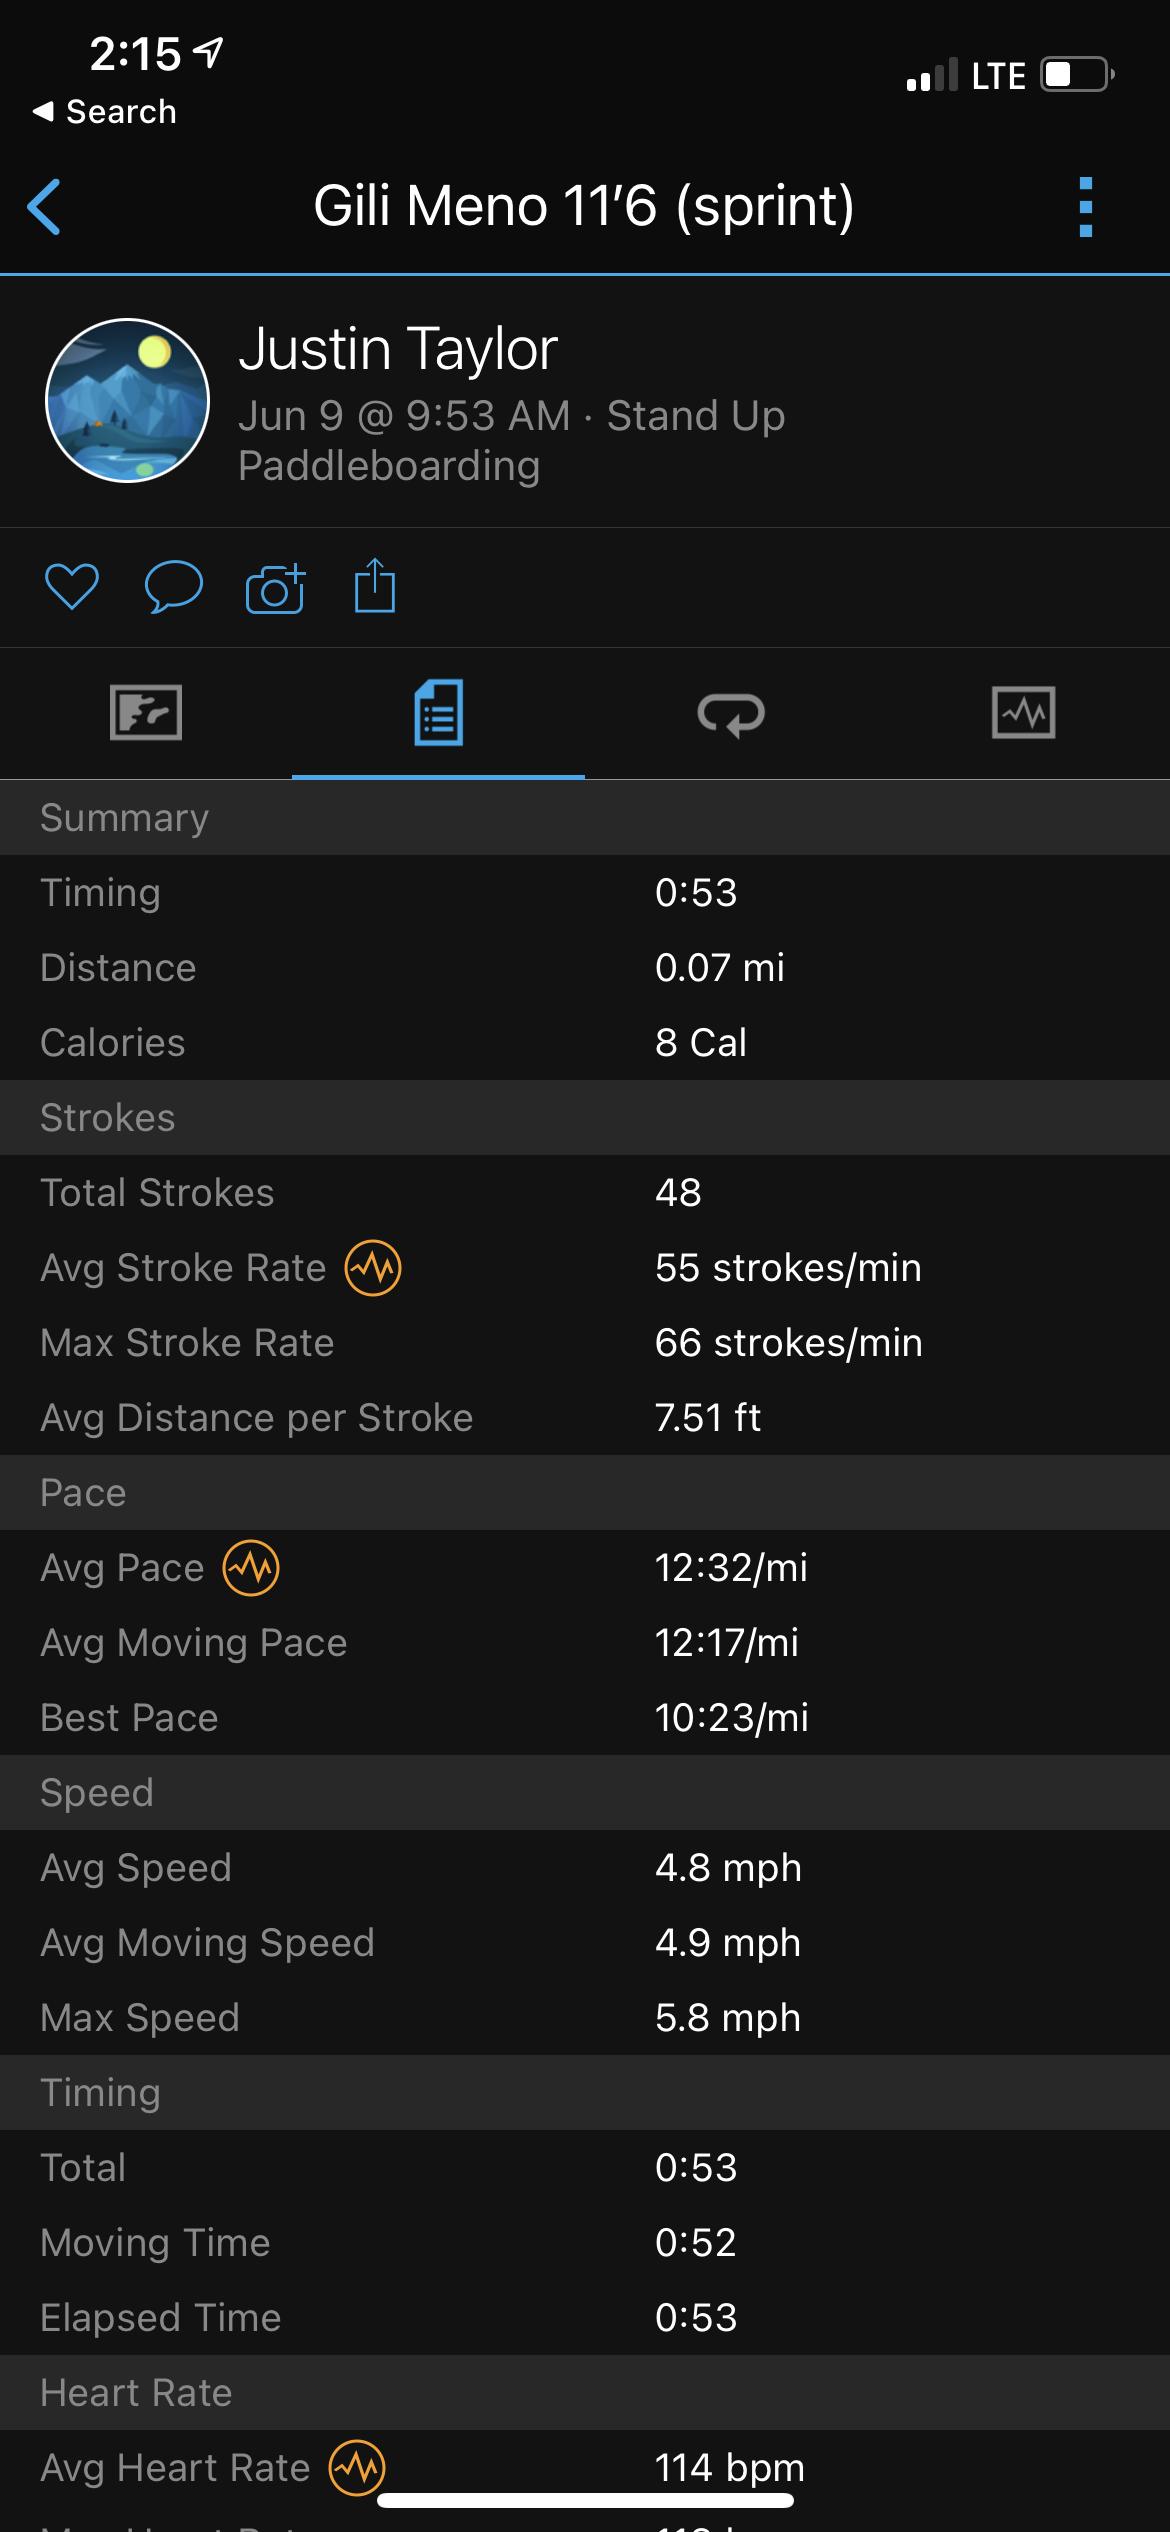 Gili Meno 11'6 sprint test